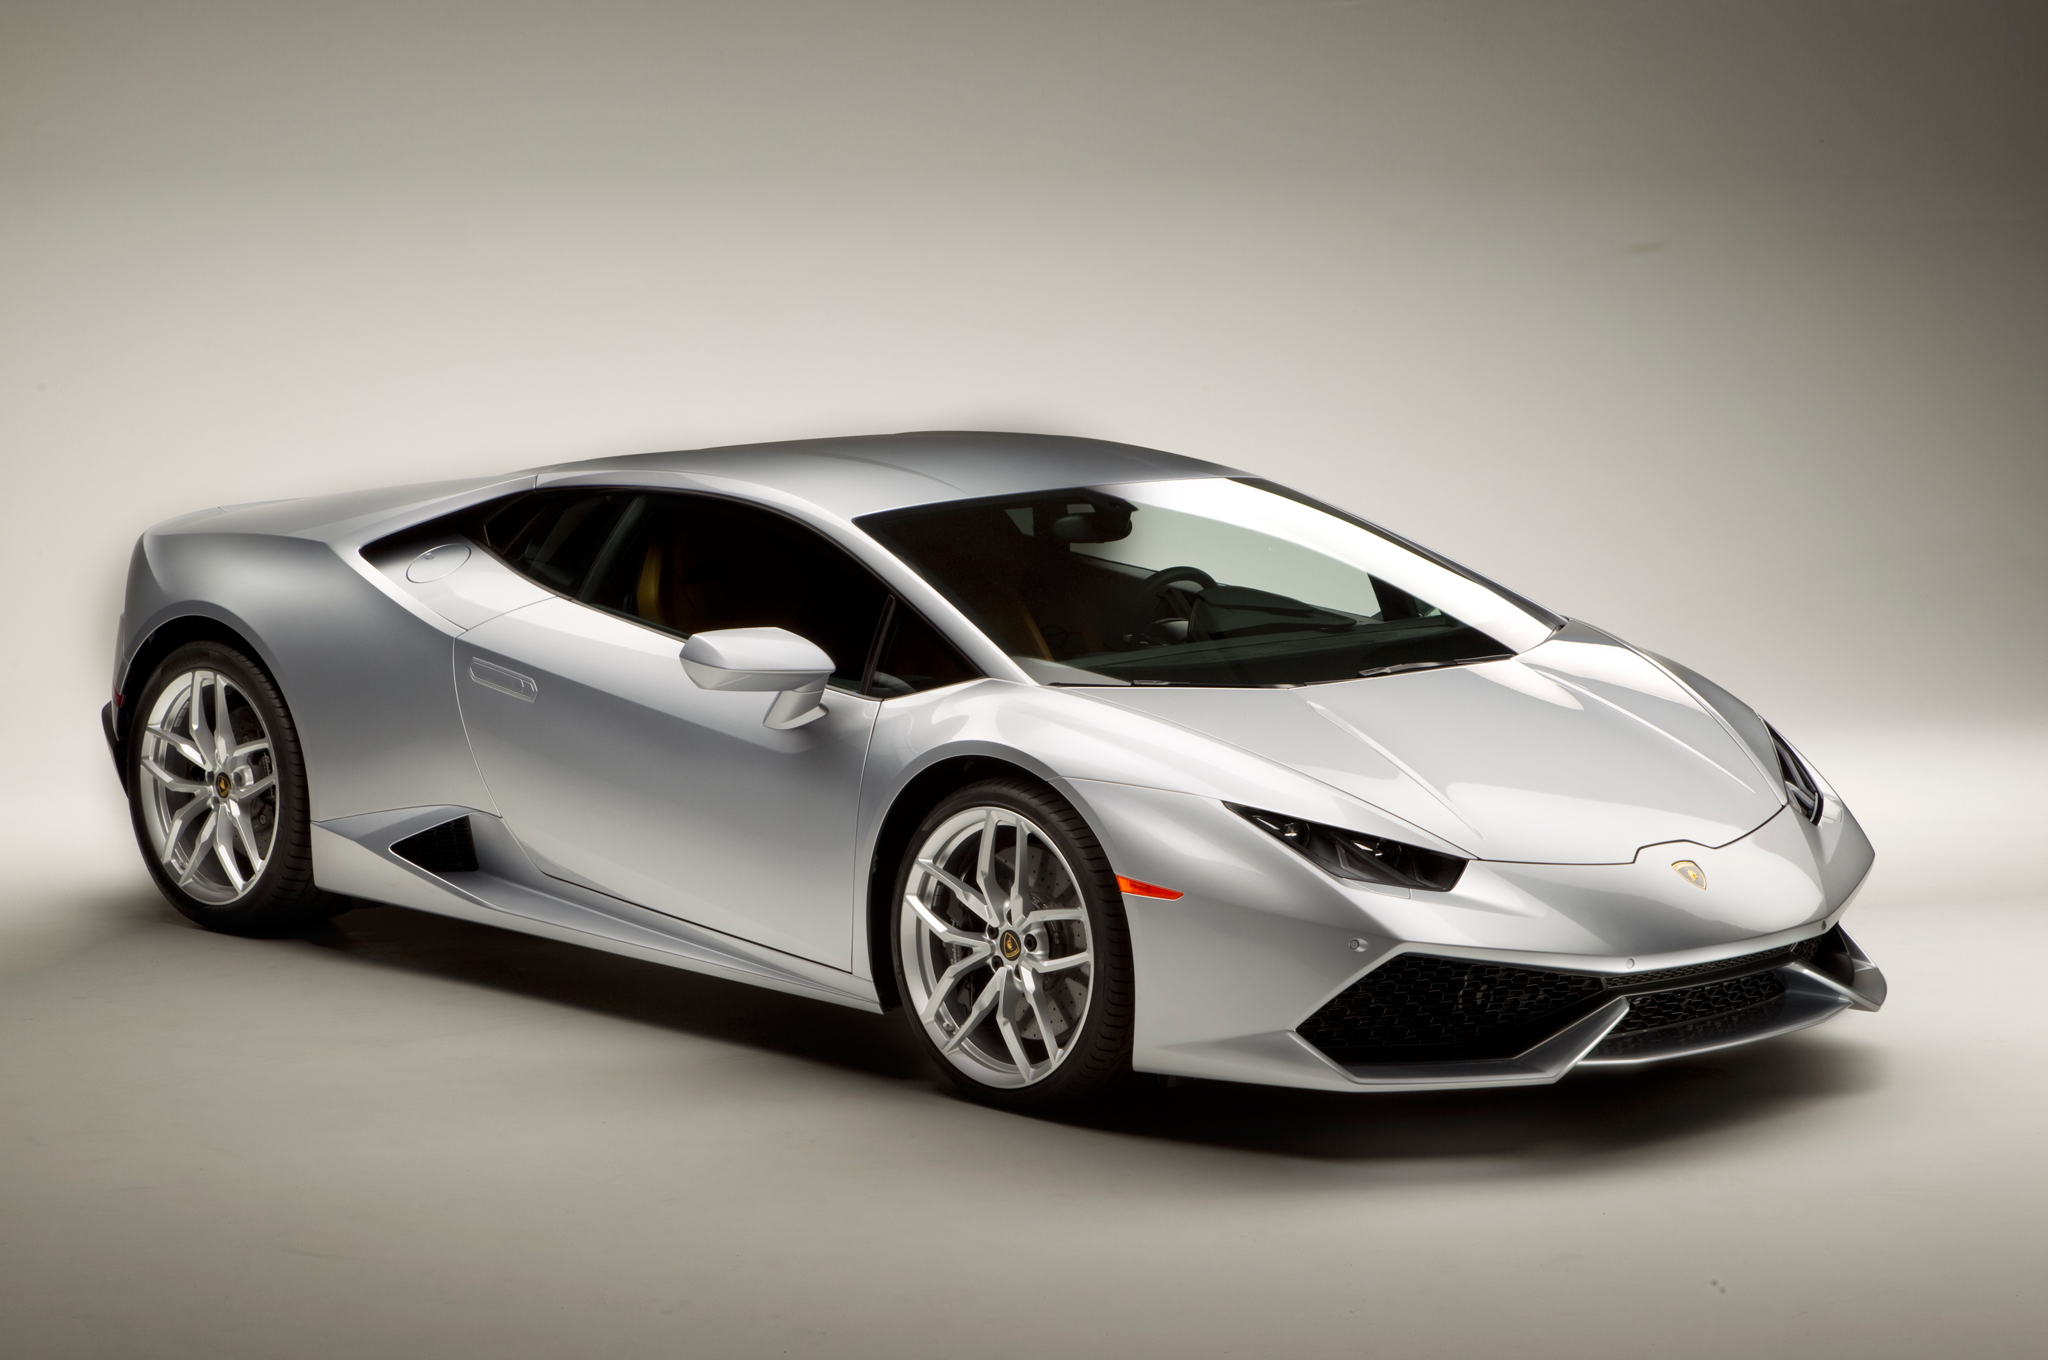 http—image.motortrend.com-f-roadtests-exotic-1312_2015_lamborghini_huracan_first_look-59411702-2015-Lamborghini-Huracan-front-three-quarters-02